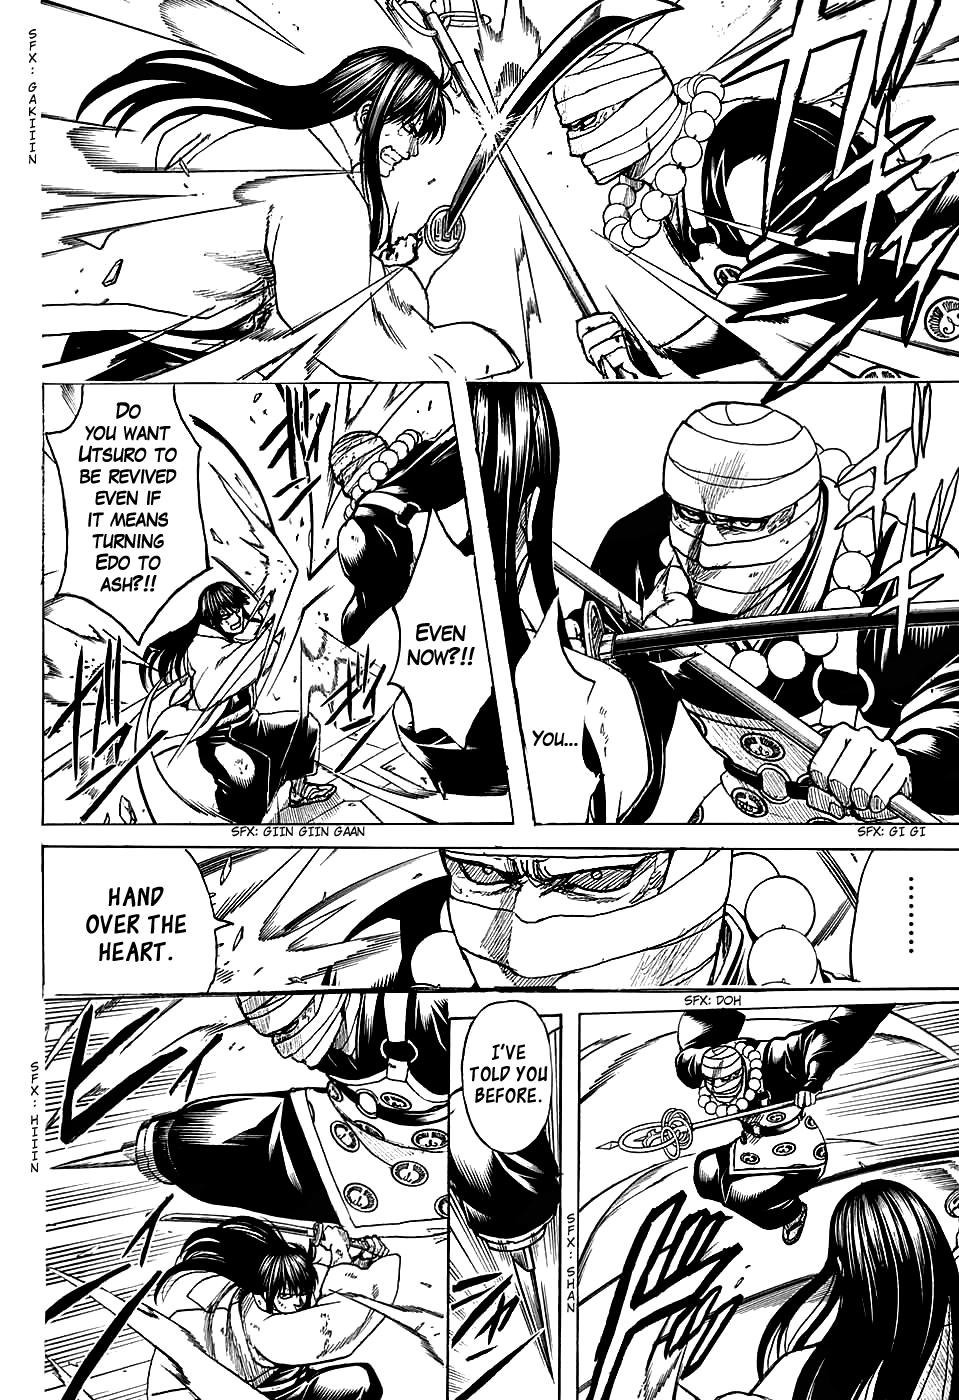 Gintama Chapter 701  Online Free Manga Read Image 40